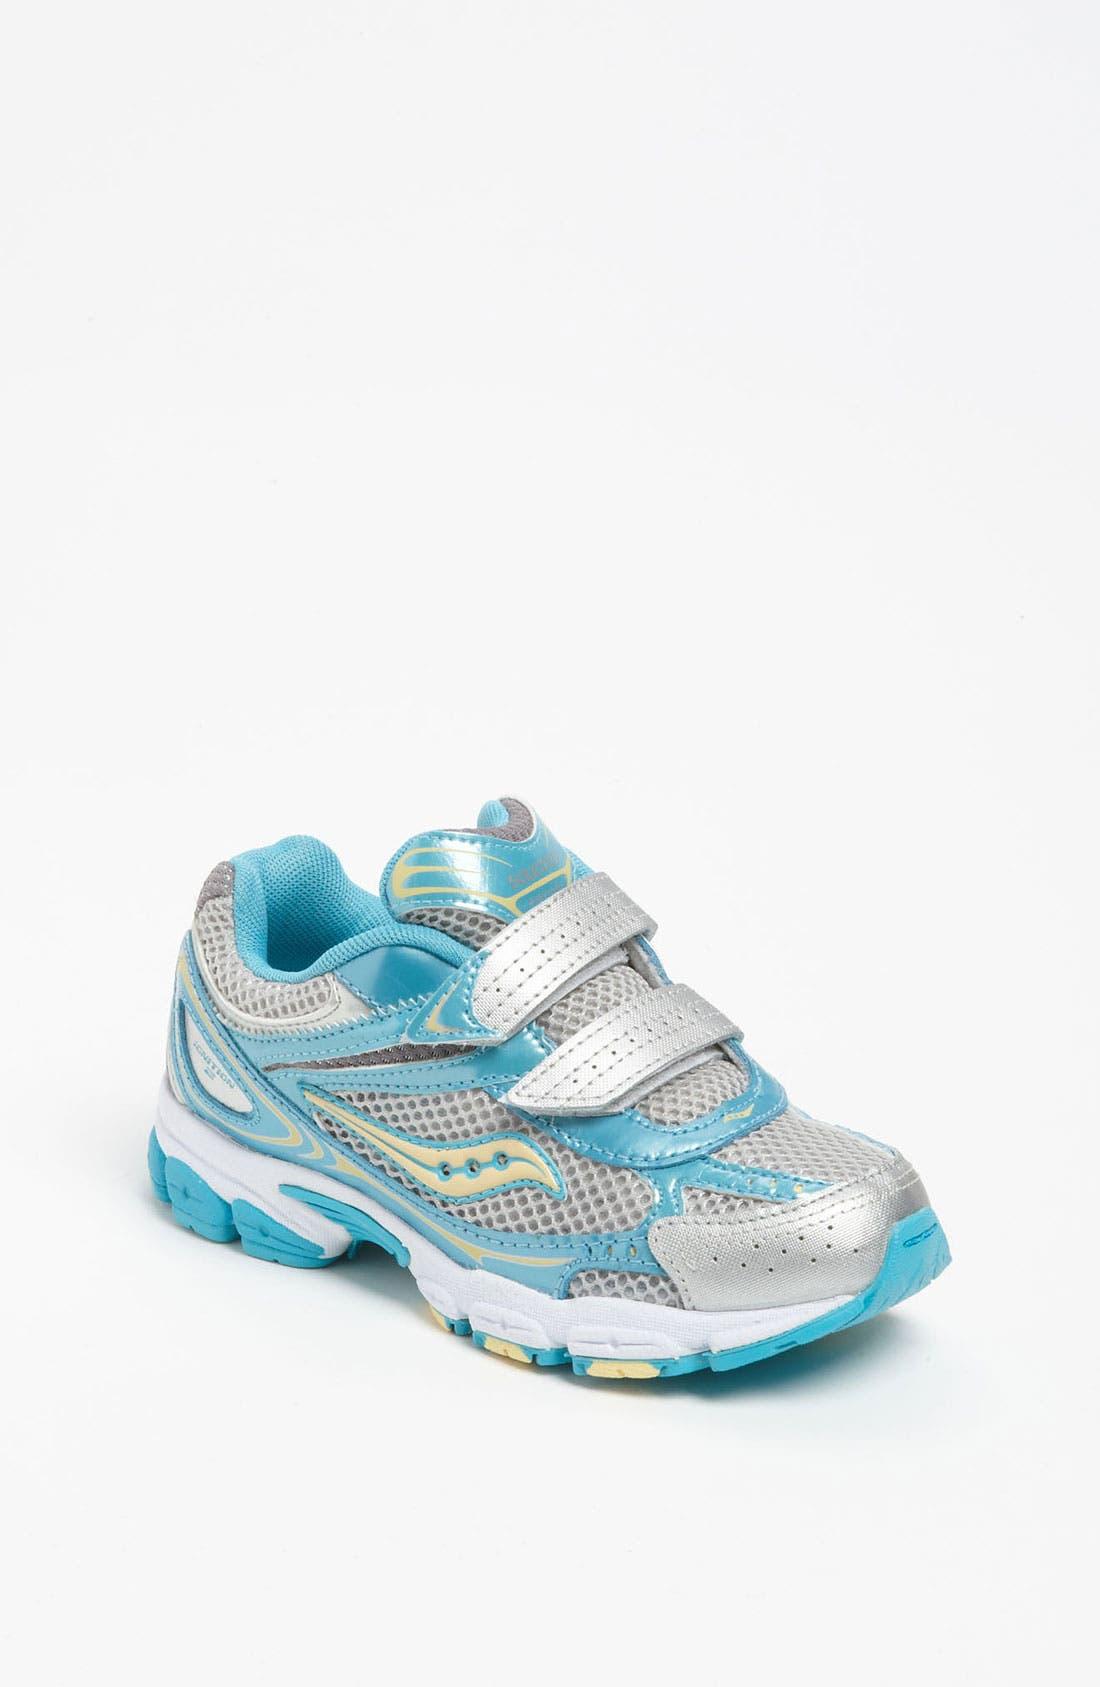 Alternate Image 1 Selected - Saucony 'Grid Profile' Sneaker (Toddler & Little Kid)